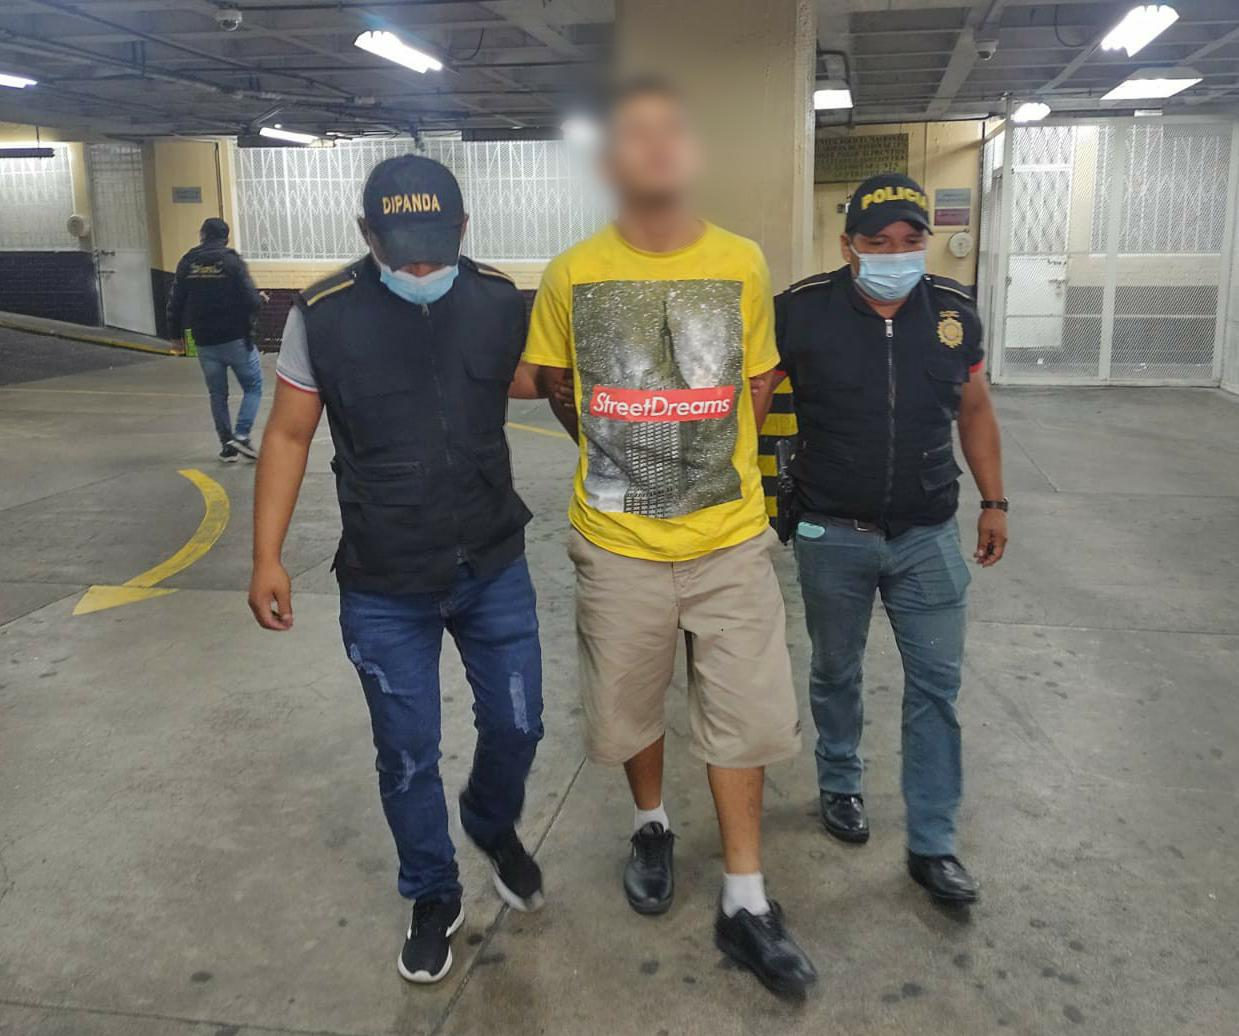 Presuntos pandilleros capturados por atacar a investigadores de la PNC